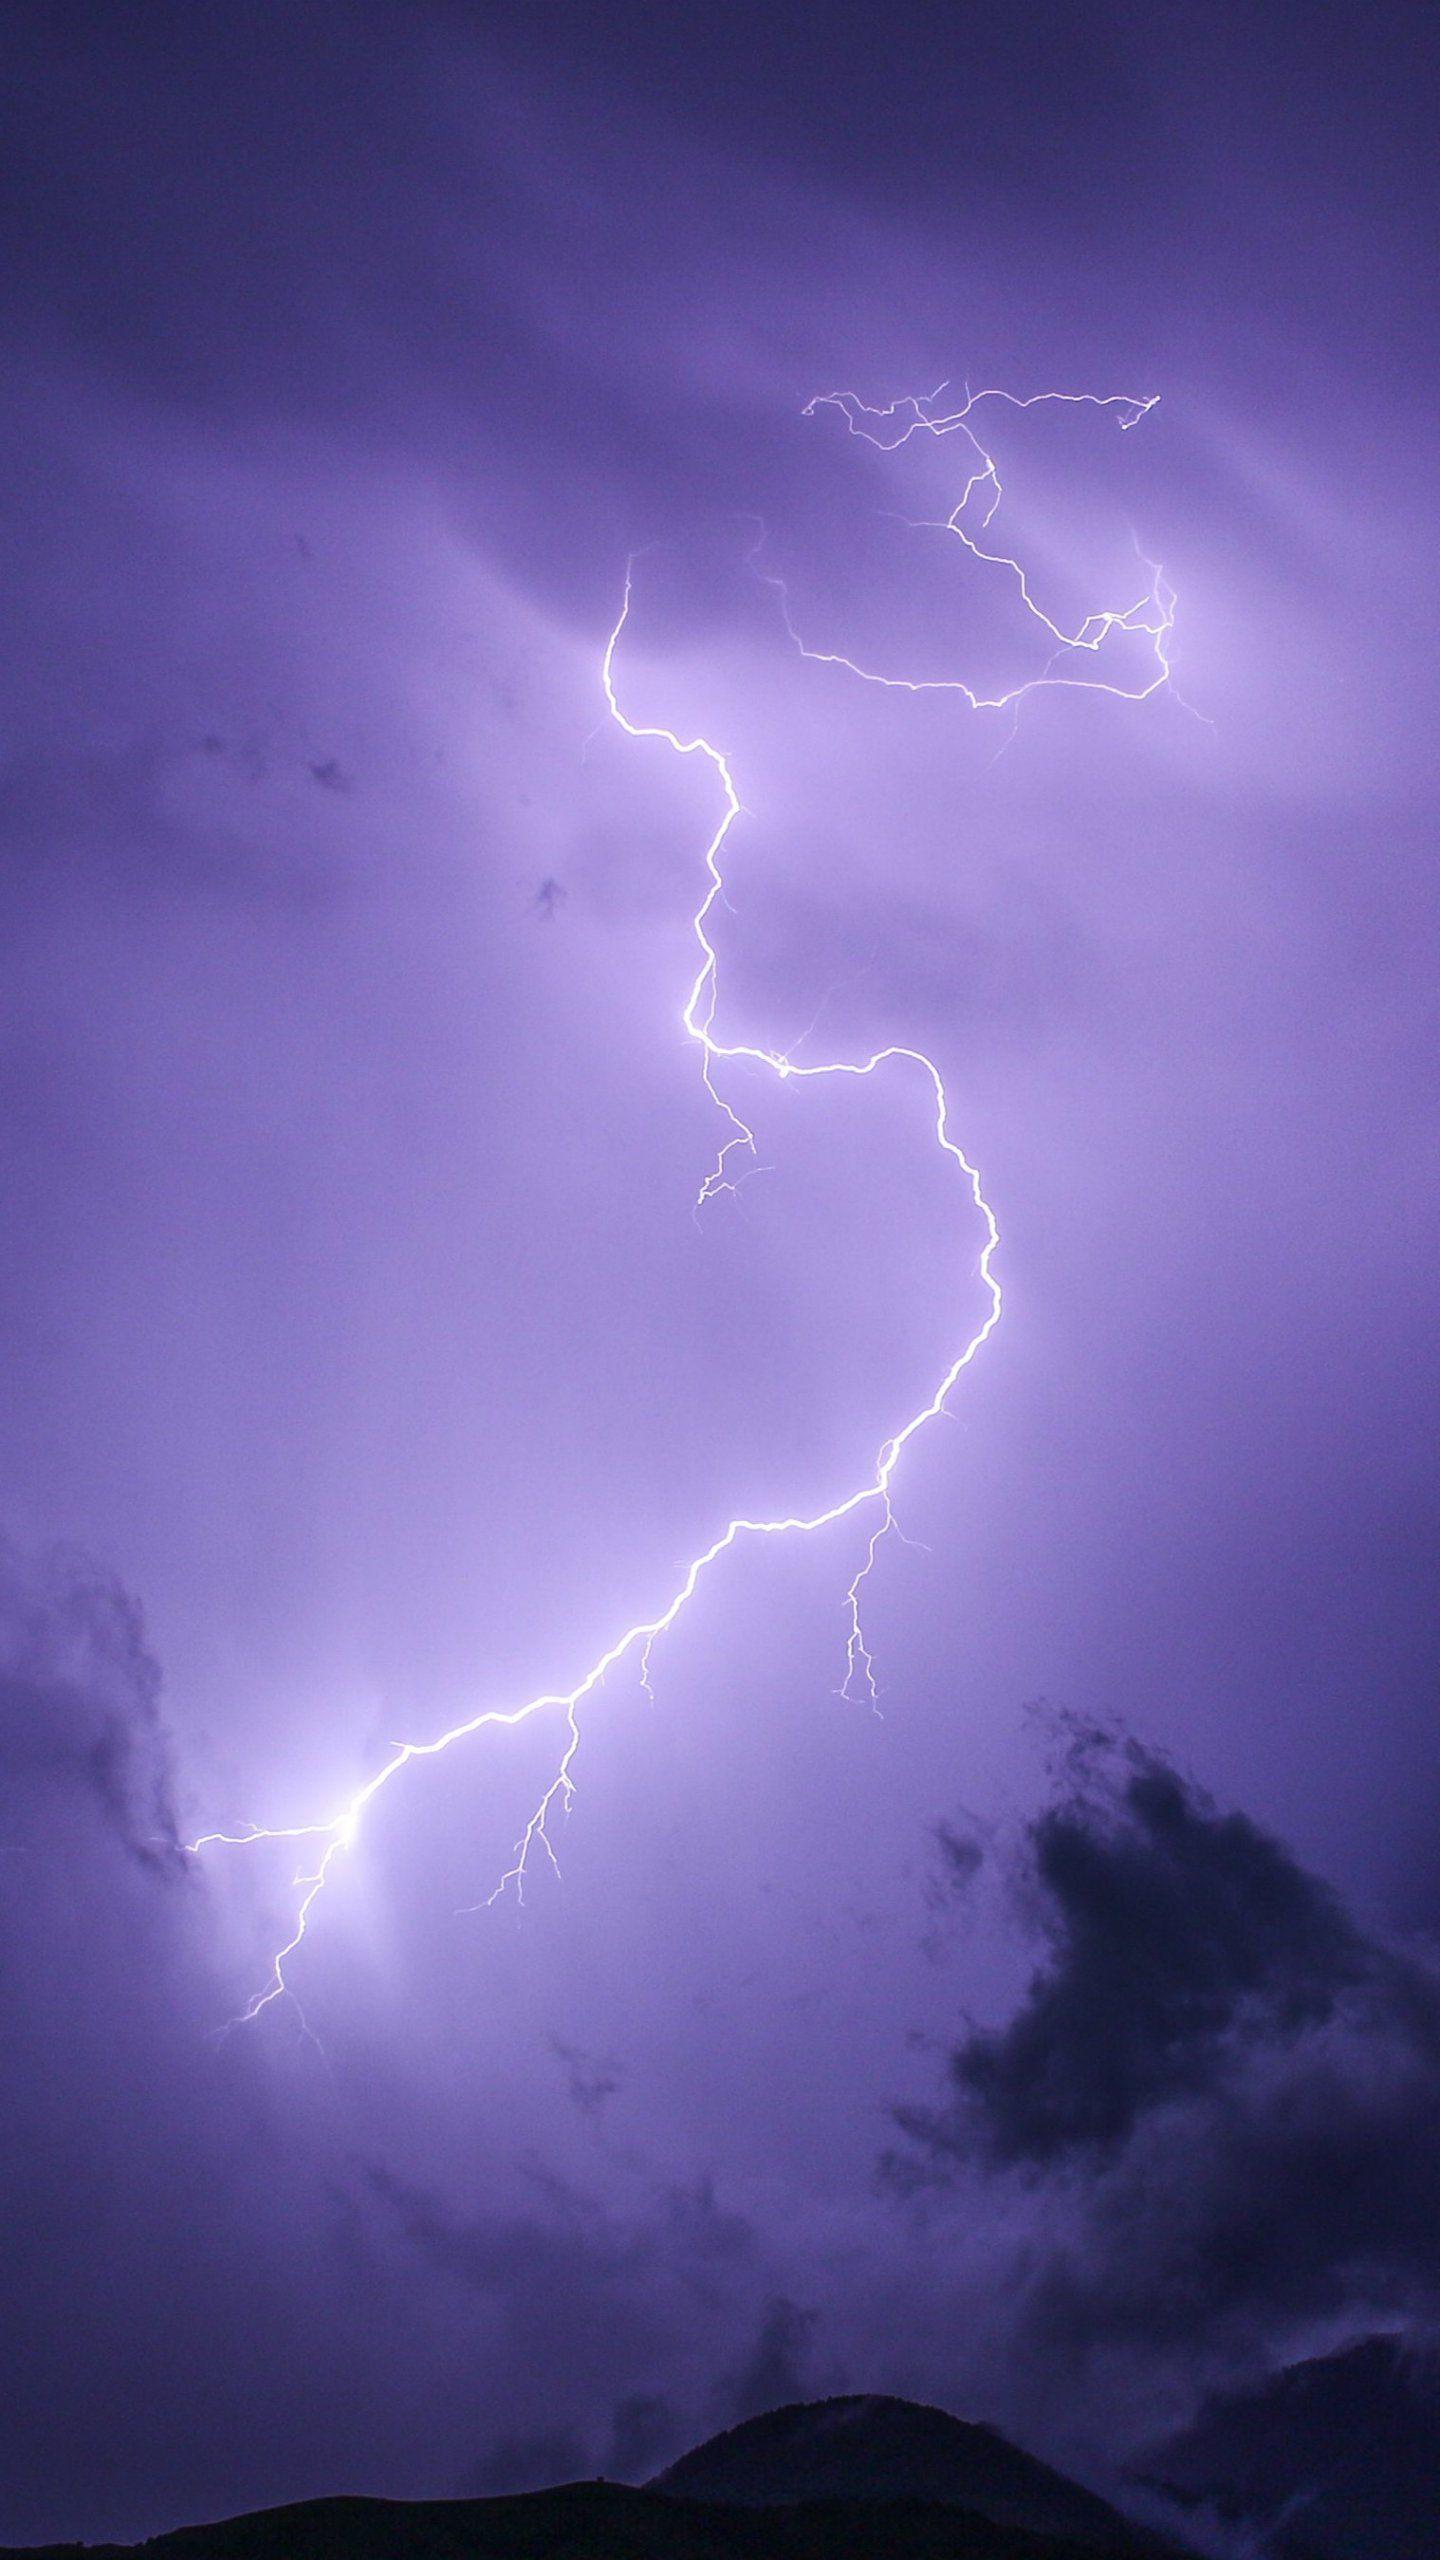 Purple Lightning Wallpaper iPhone Android & Desktop